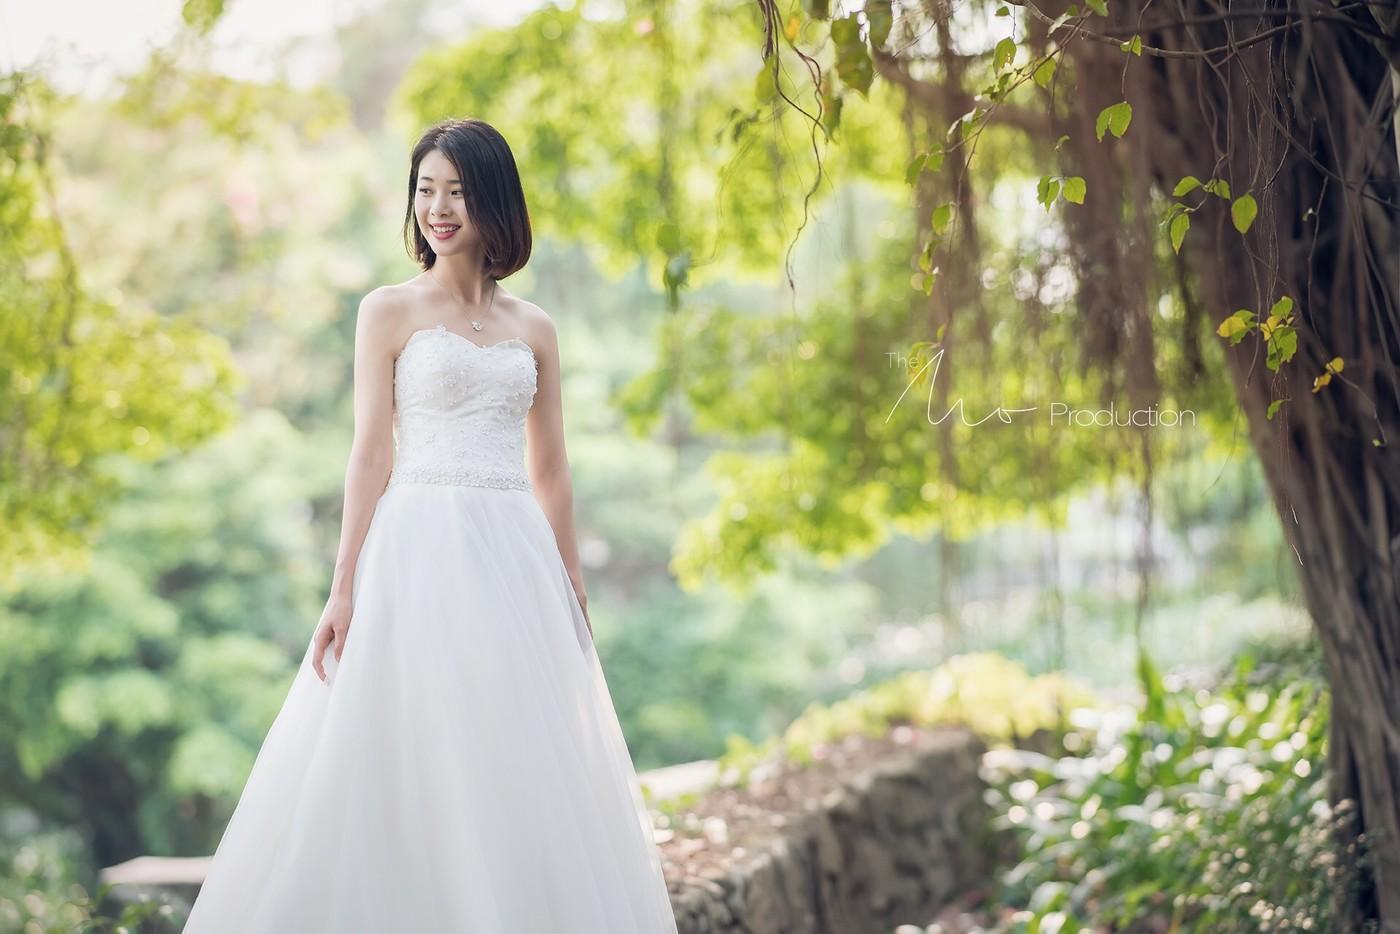 MoFoTo 深圳婚纱个人5